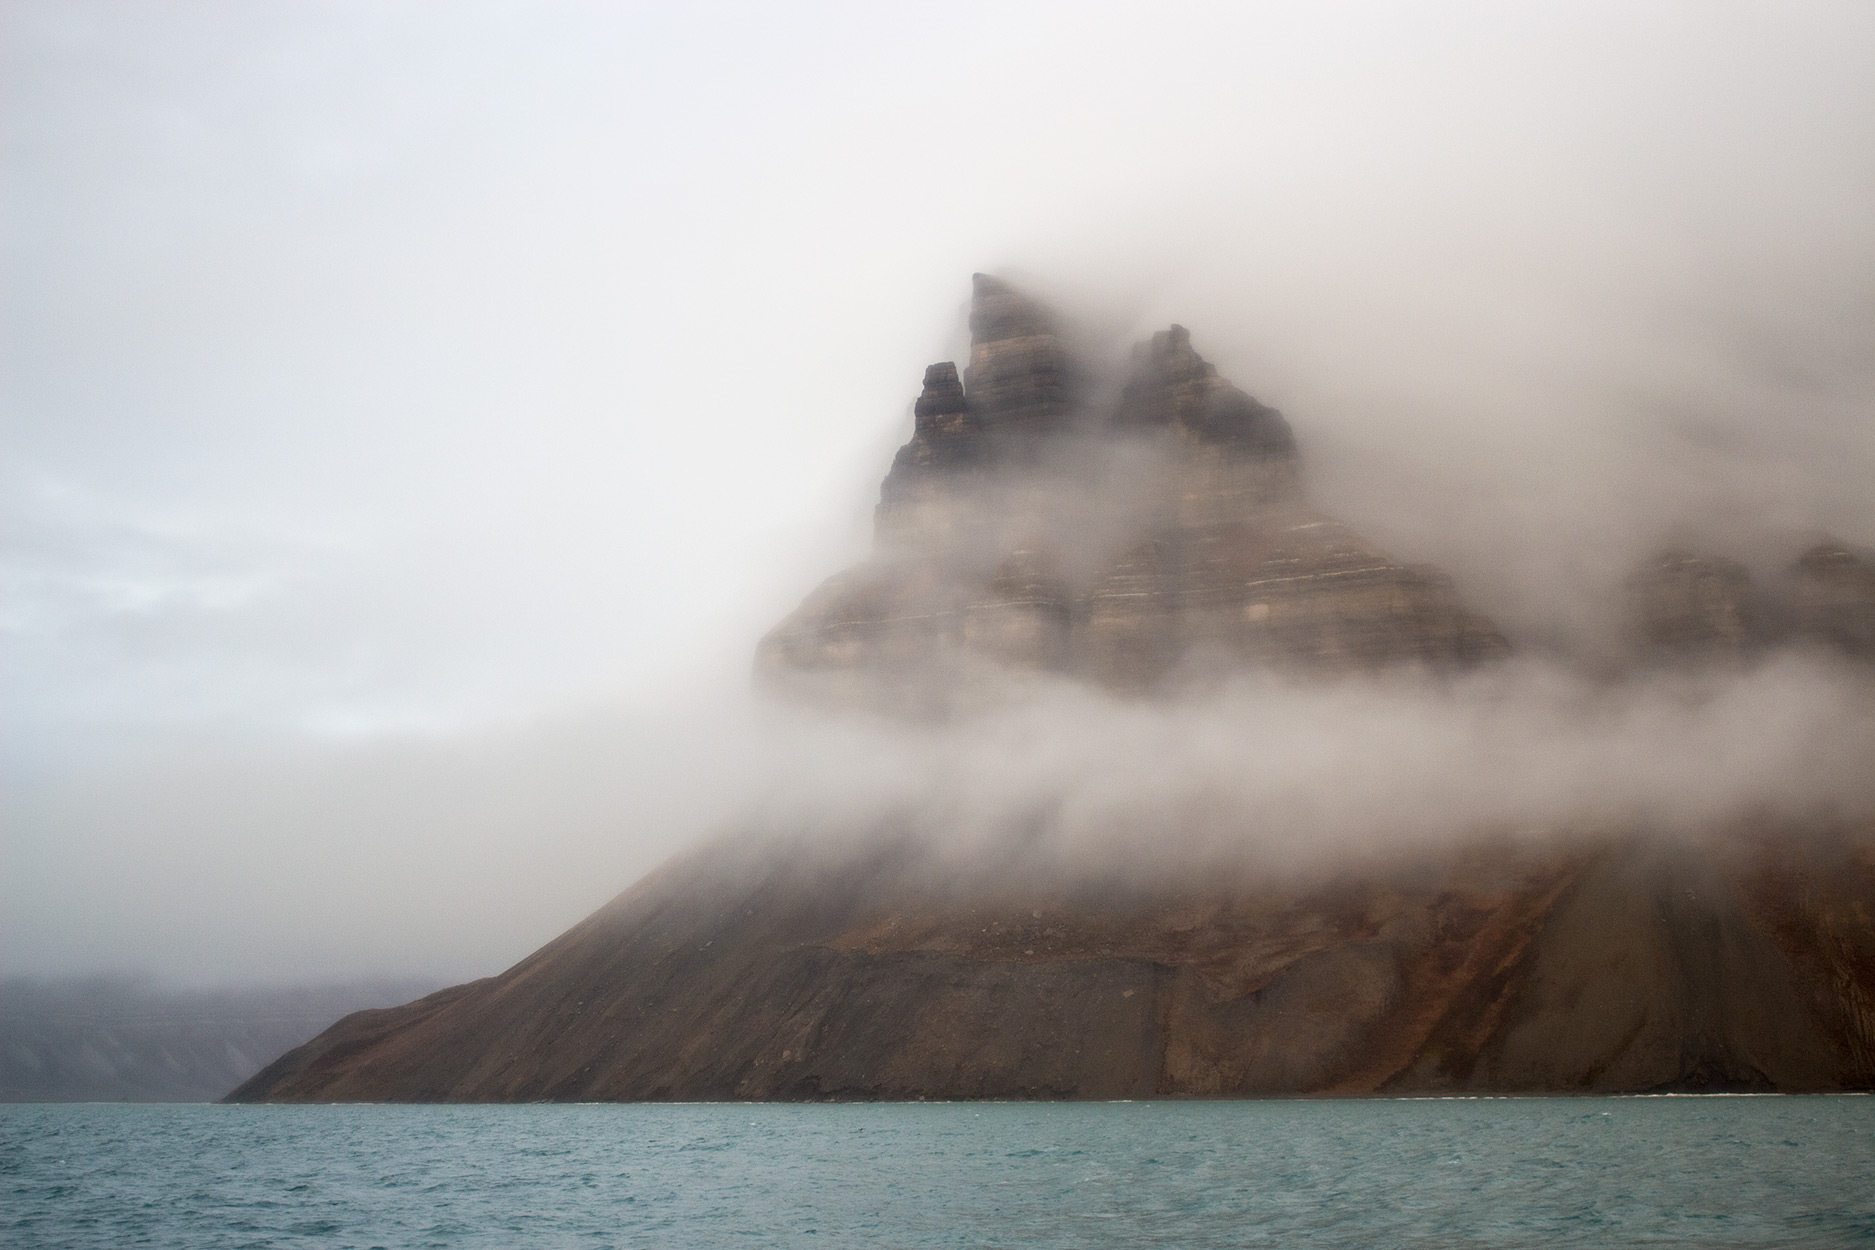 Gipshukodden, Svalbard